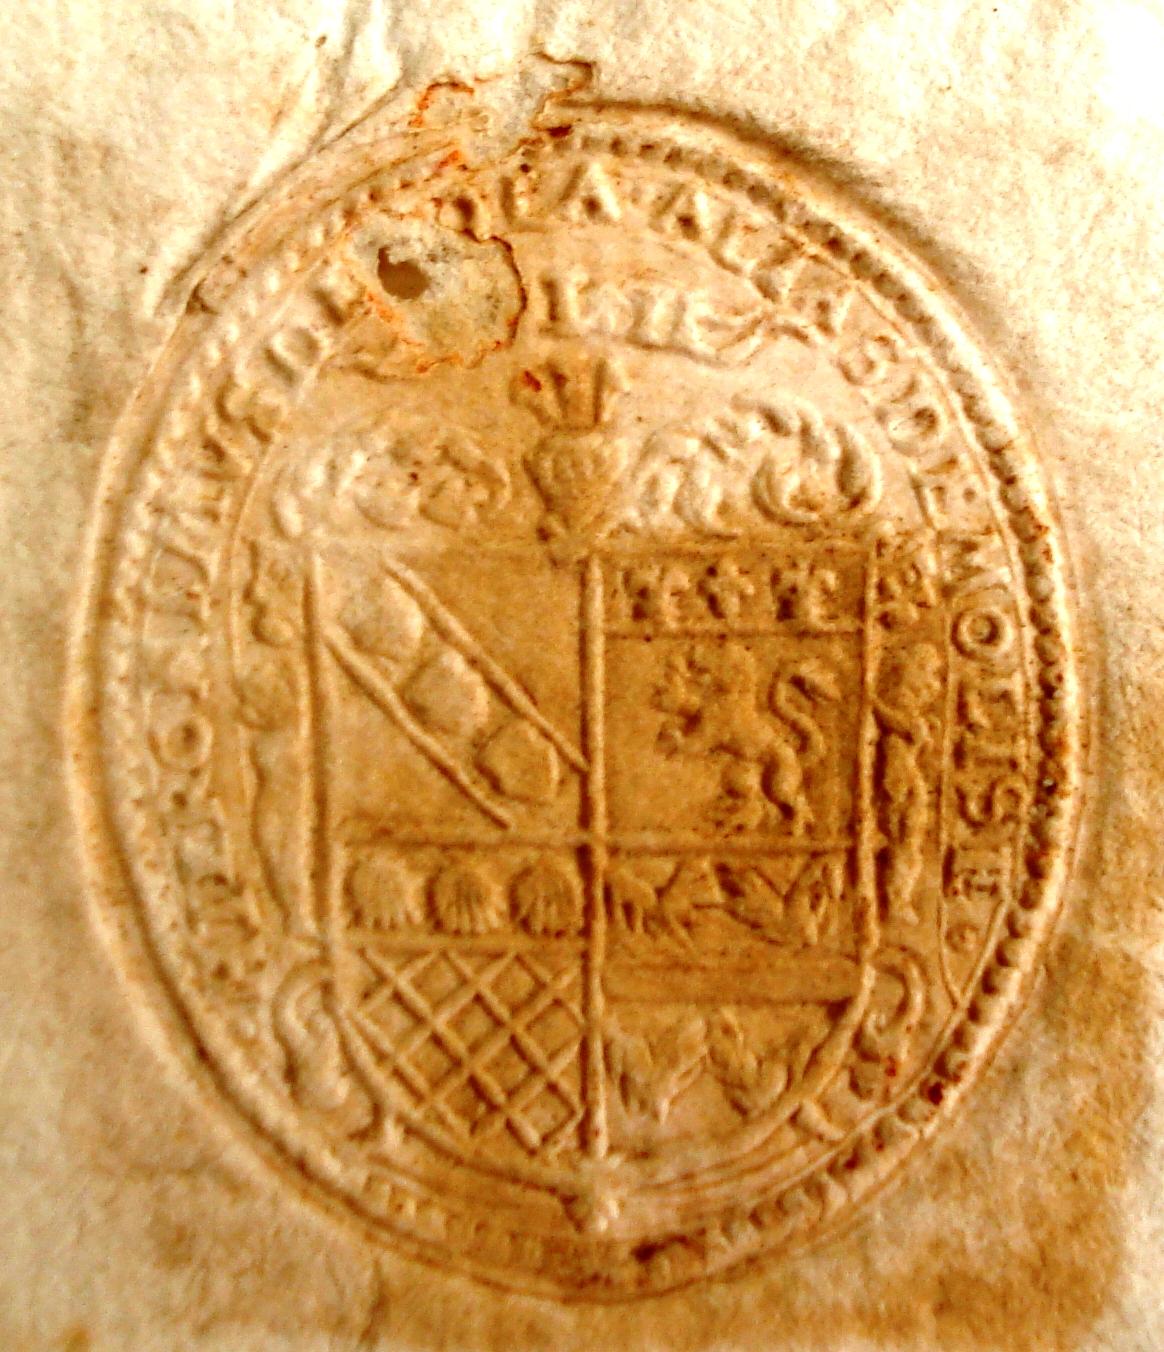 sigillo di Ieronimus de Nola alias De Molise